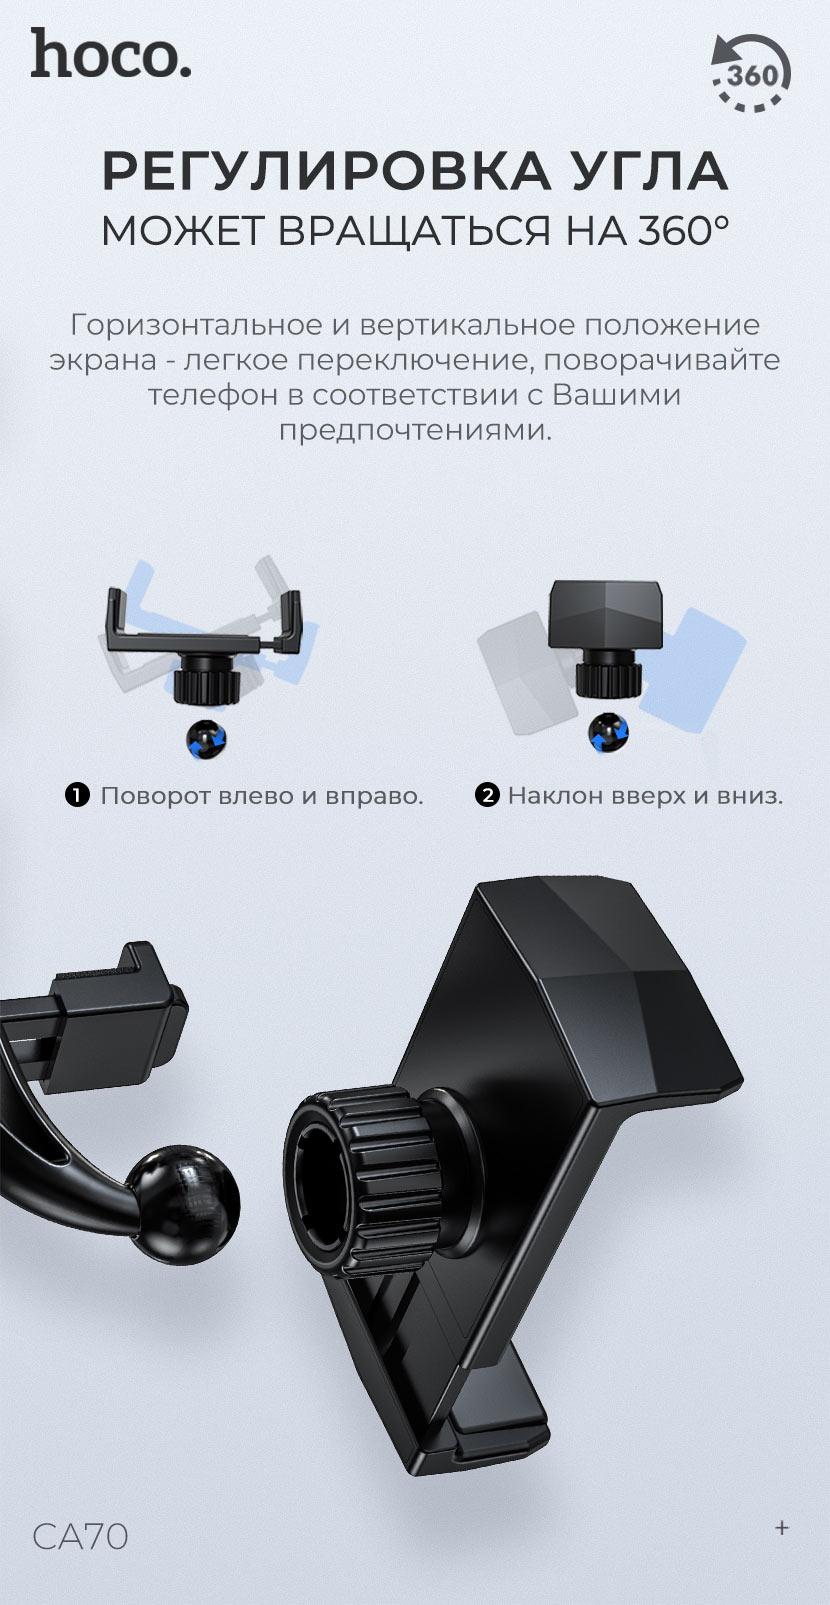 hoco news ca70 pilot in car rearview mirror mount holder adjustment ru